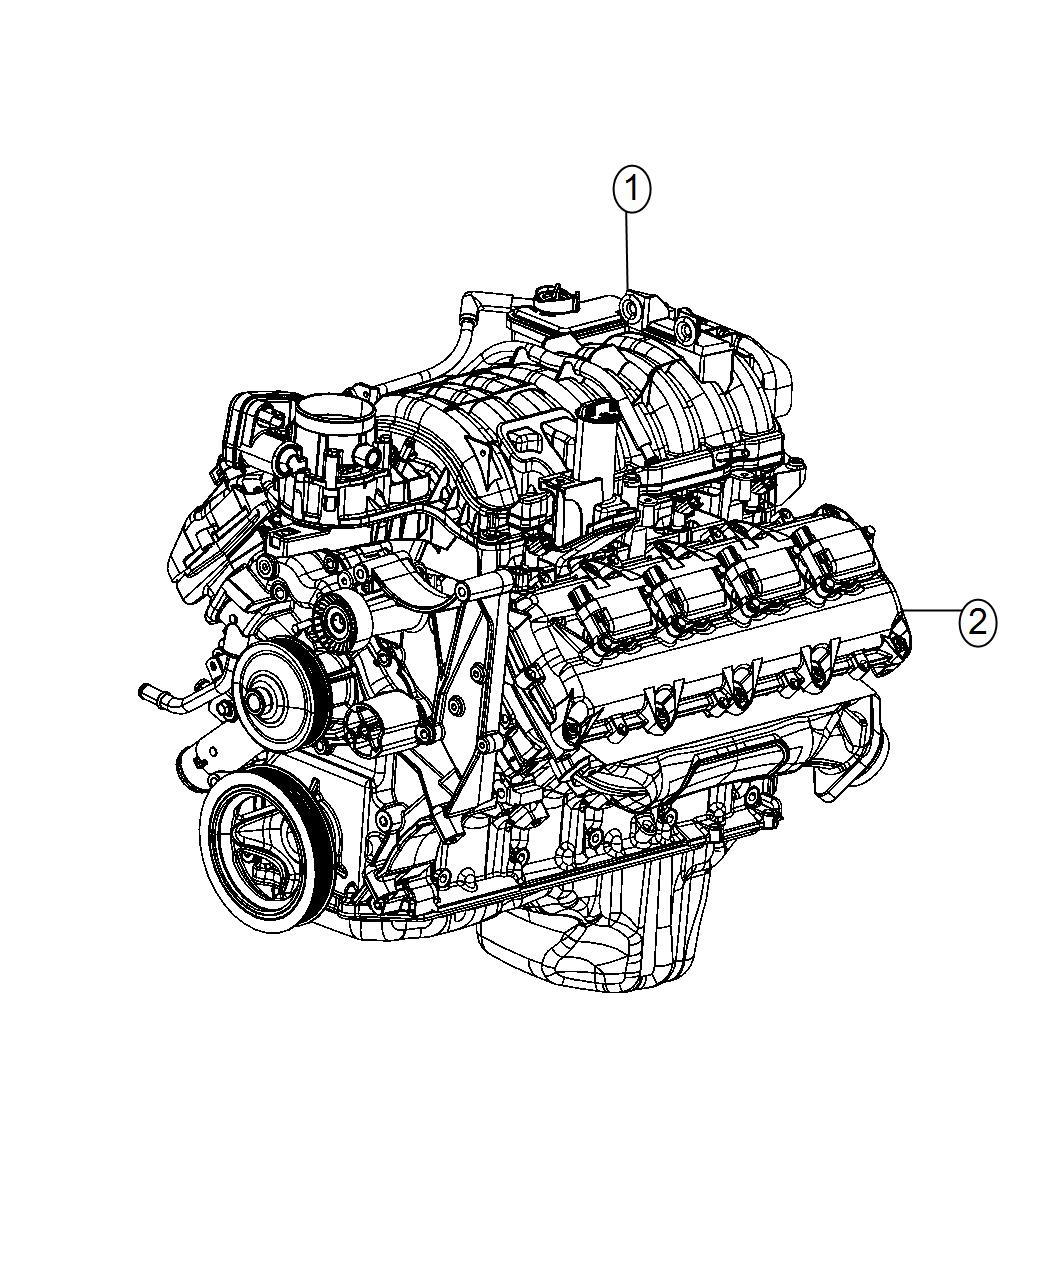 Ram Engine Complete